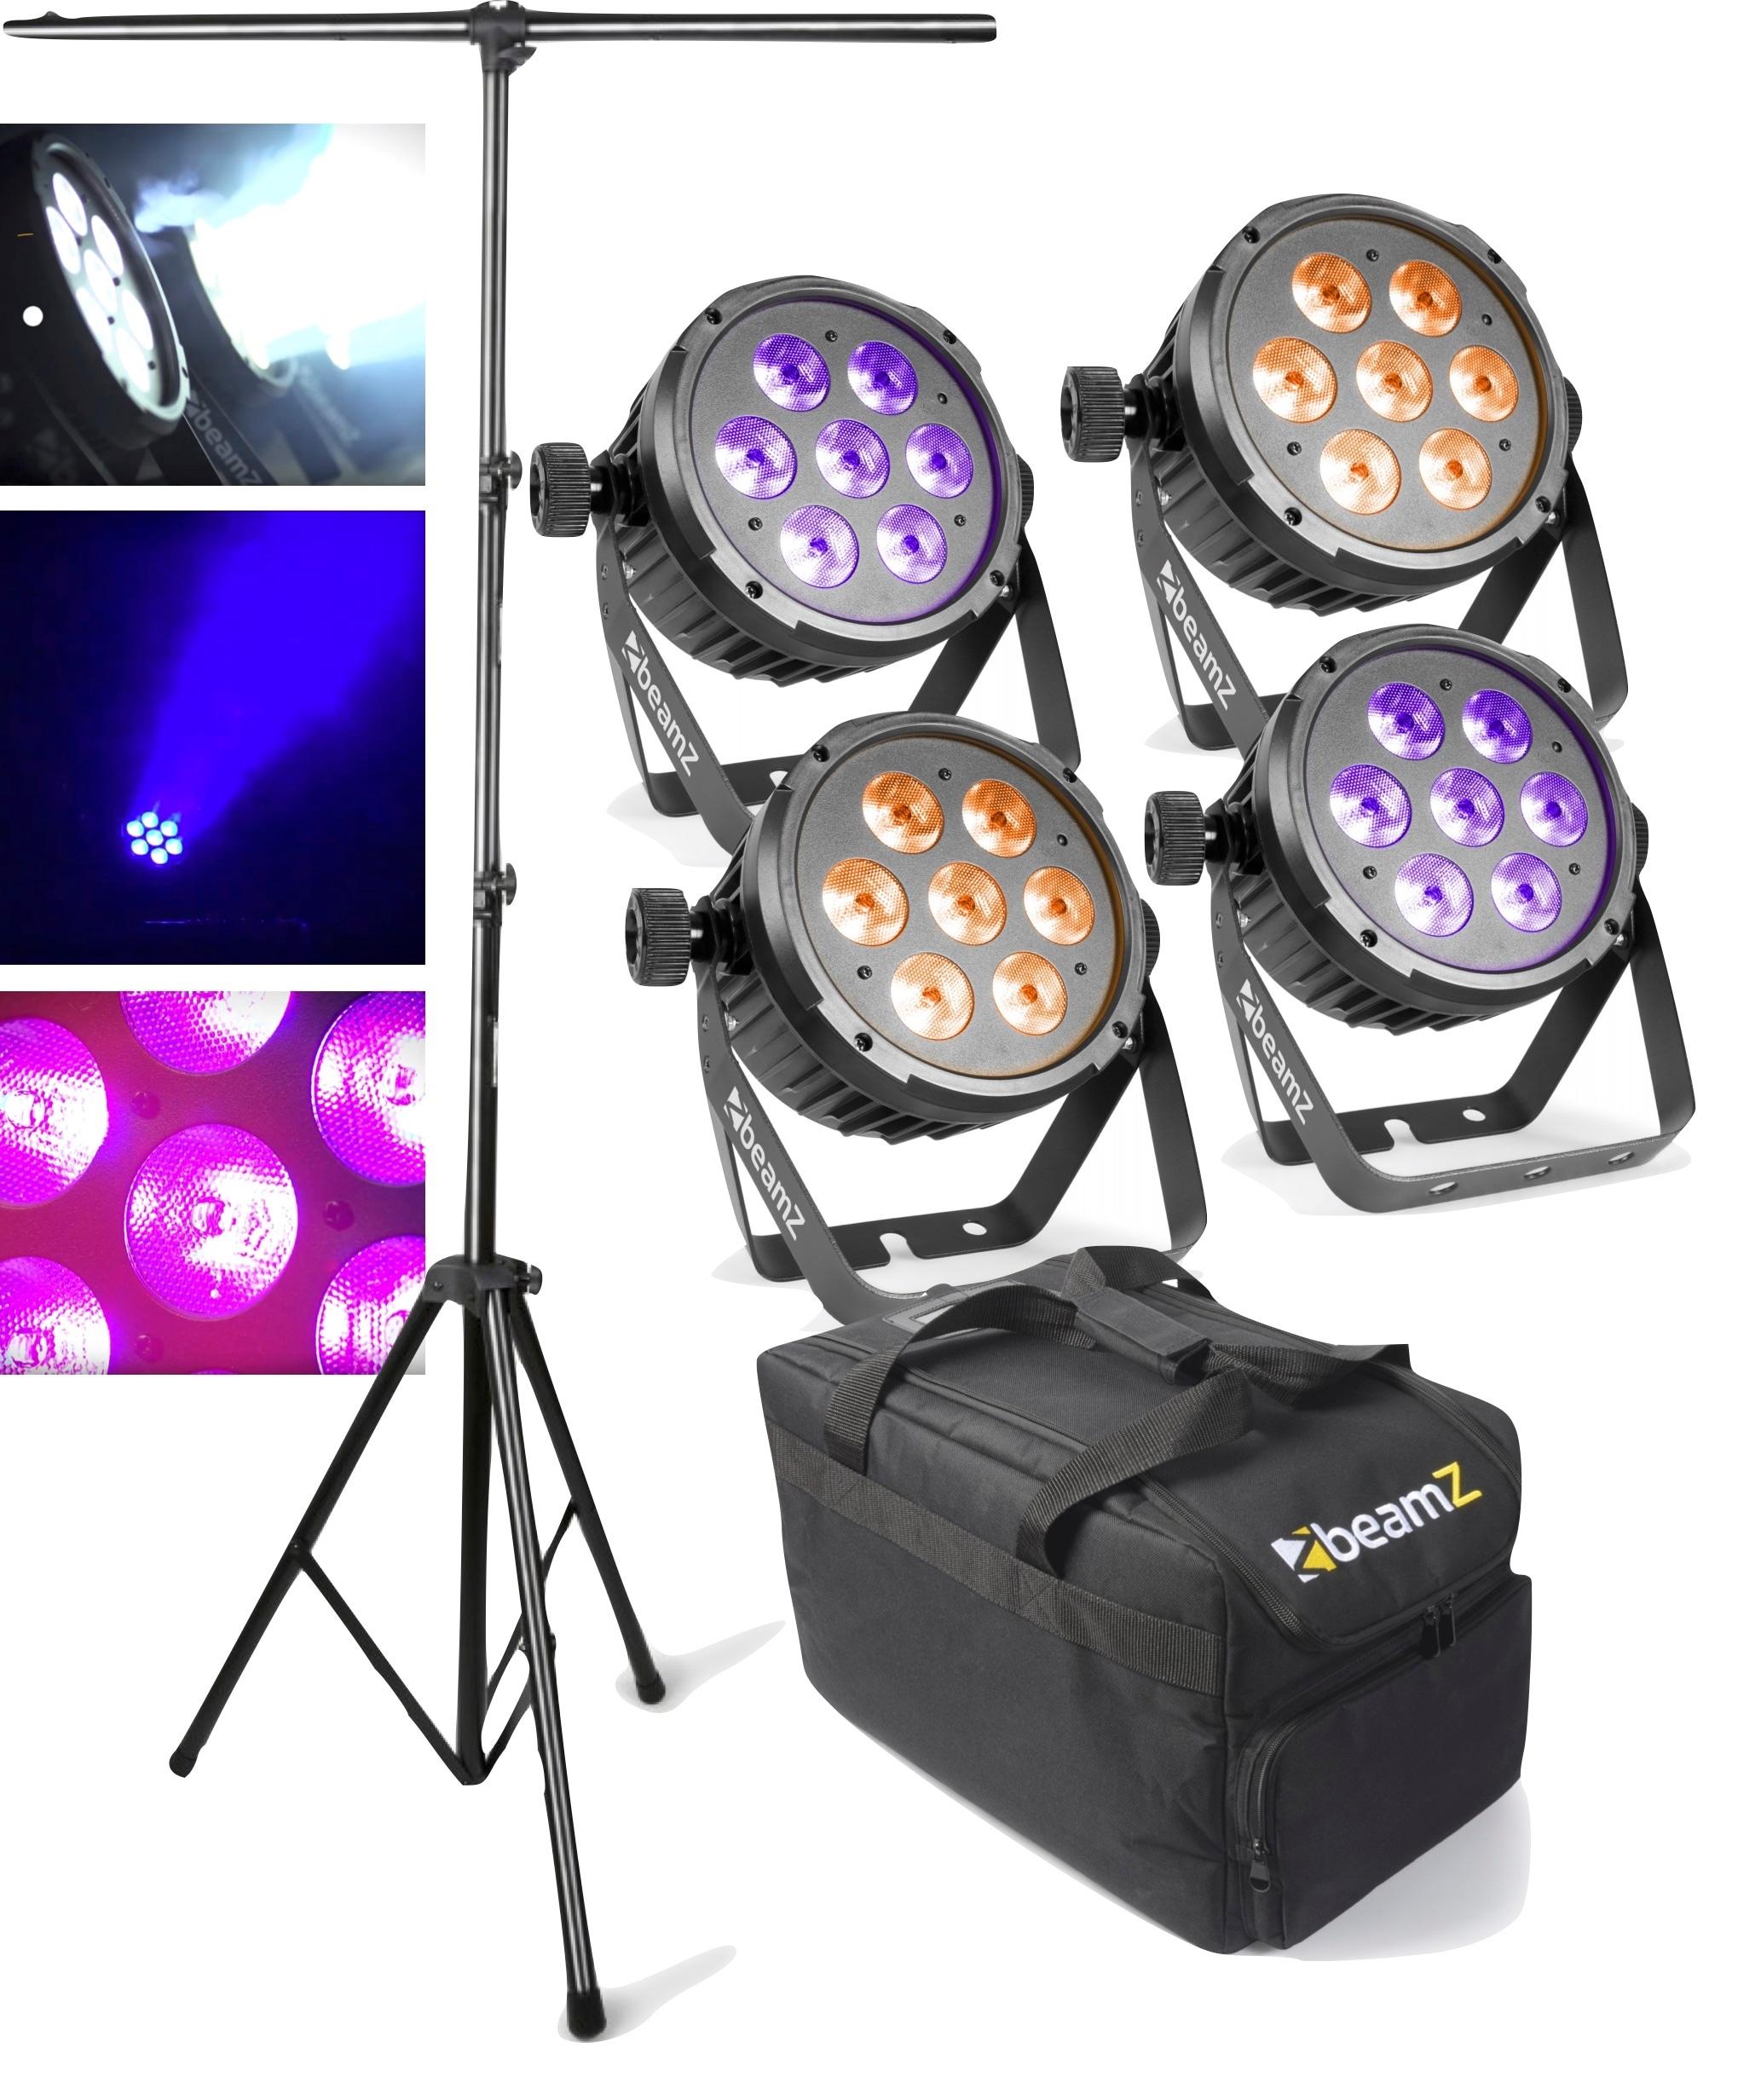 Ljuspaket med stativ + case + 4st Beamz BT280 LED Flat Par 7 x 10W RGBWA-UV 6-1 DMX IRC